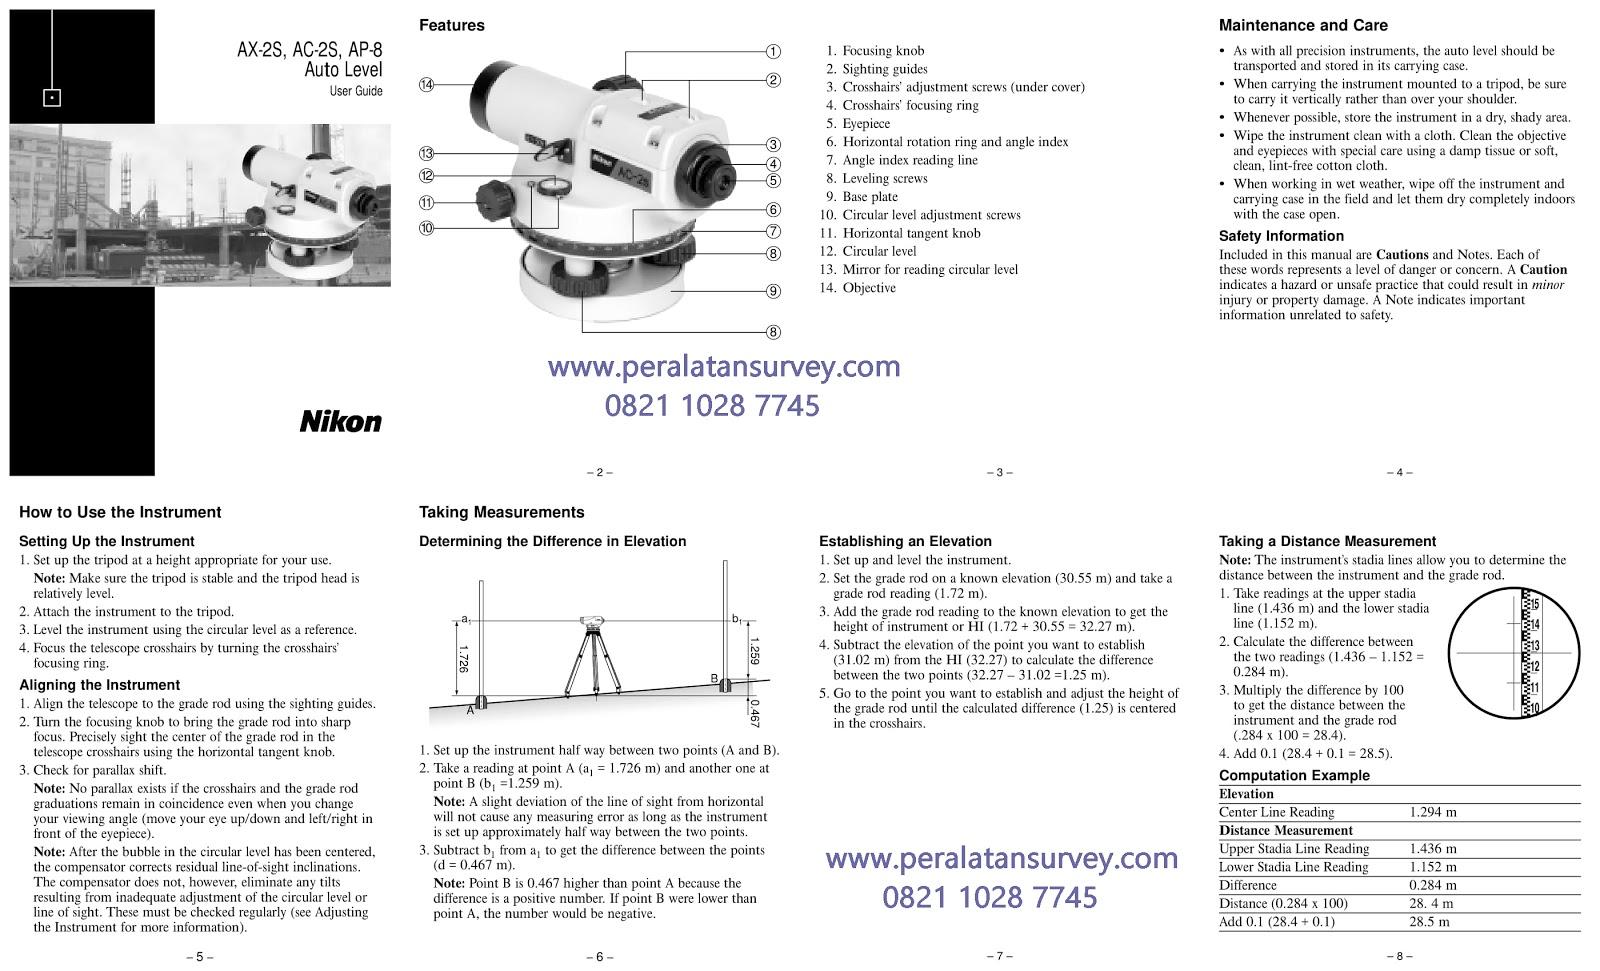 Brosur Auto Level / Waterpass Nikon AP-8  AC-2S  AX-2S Series